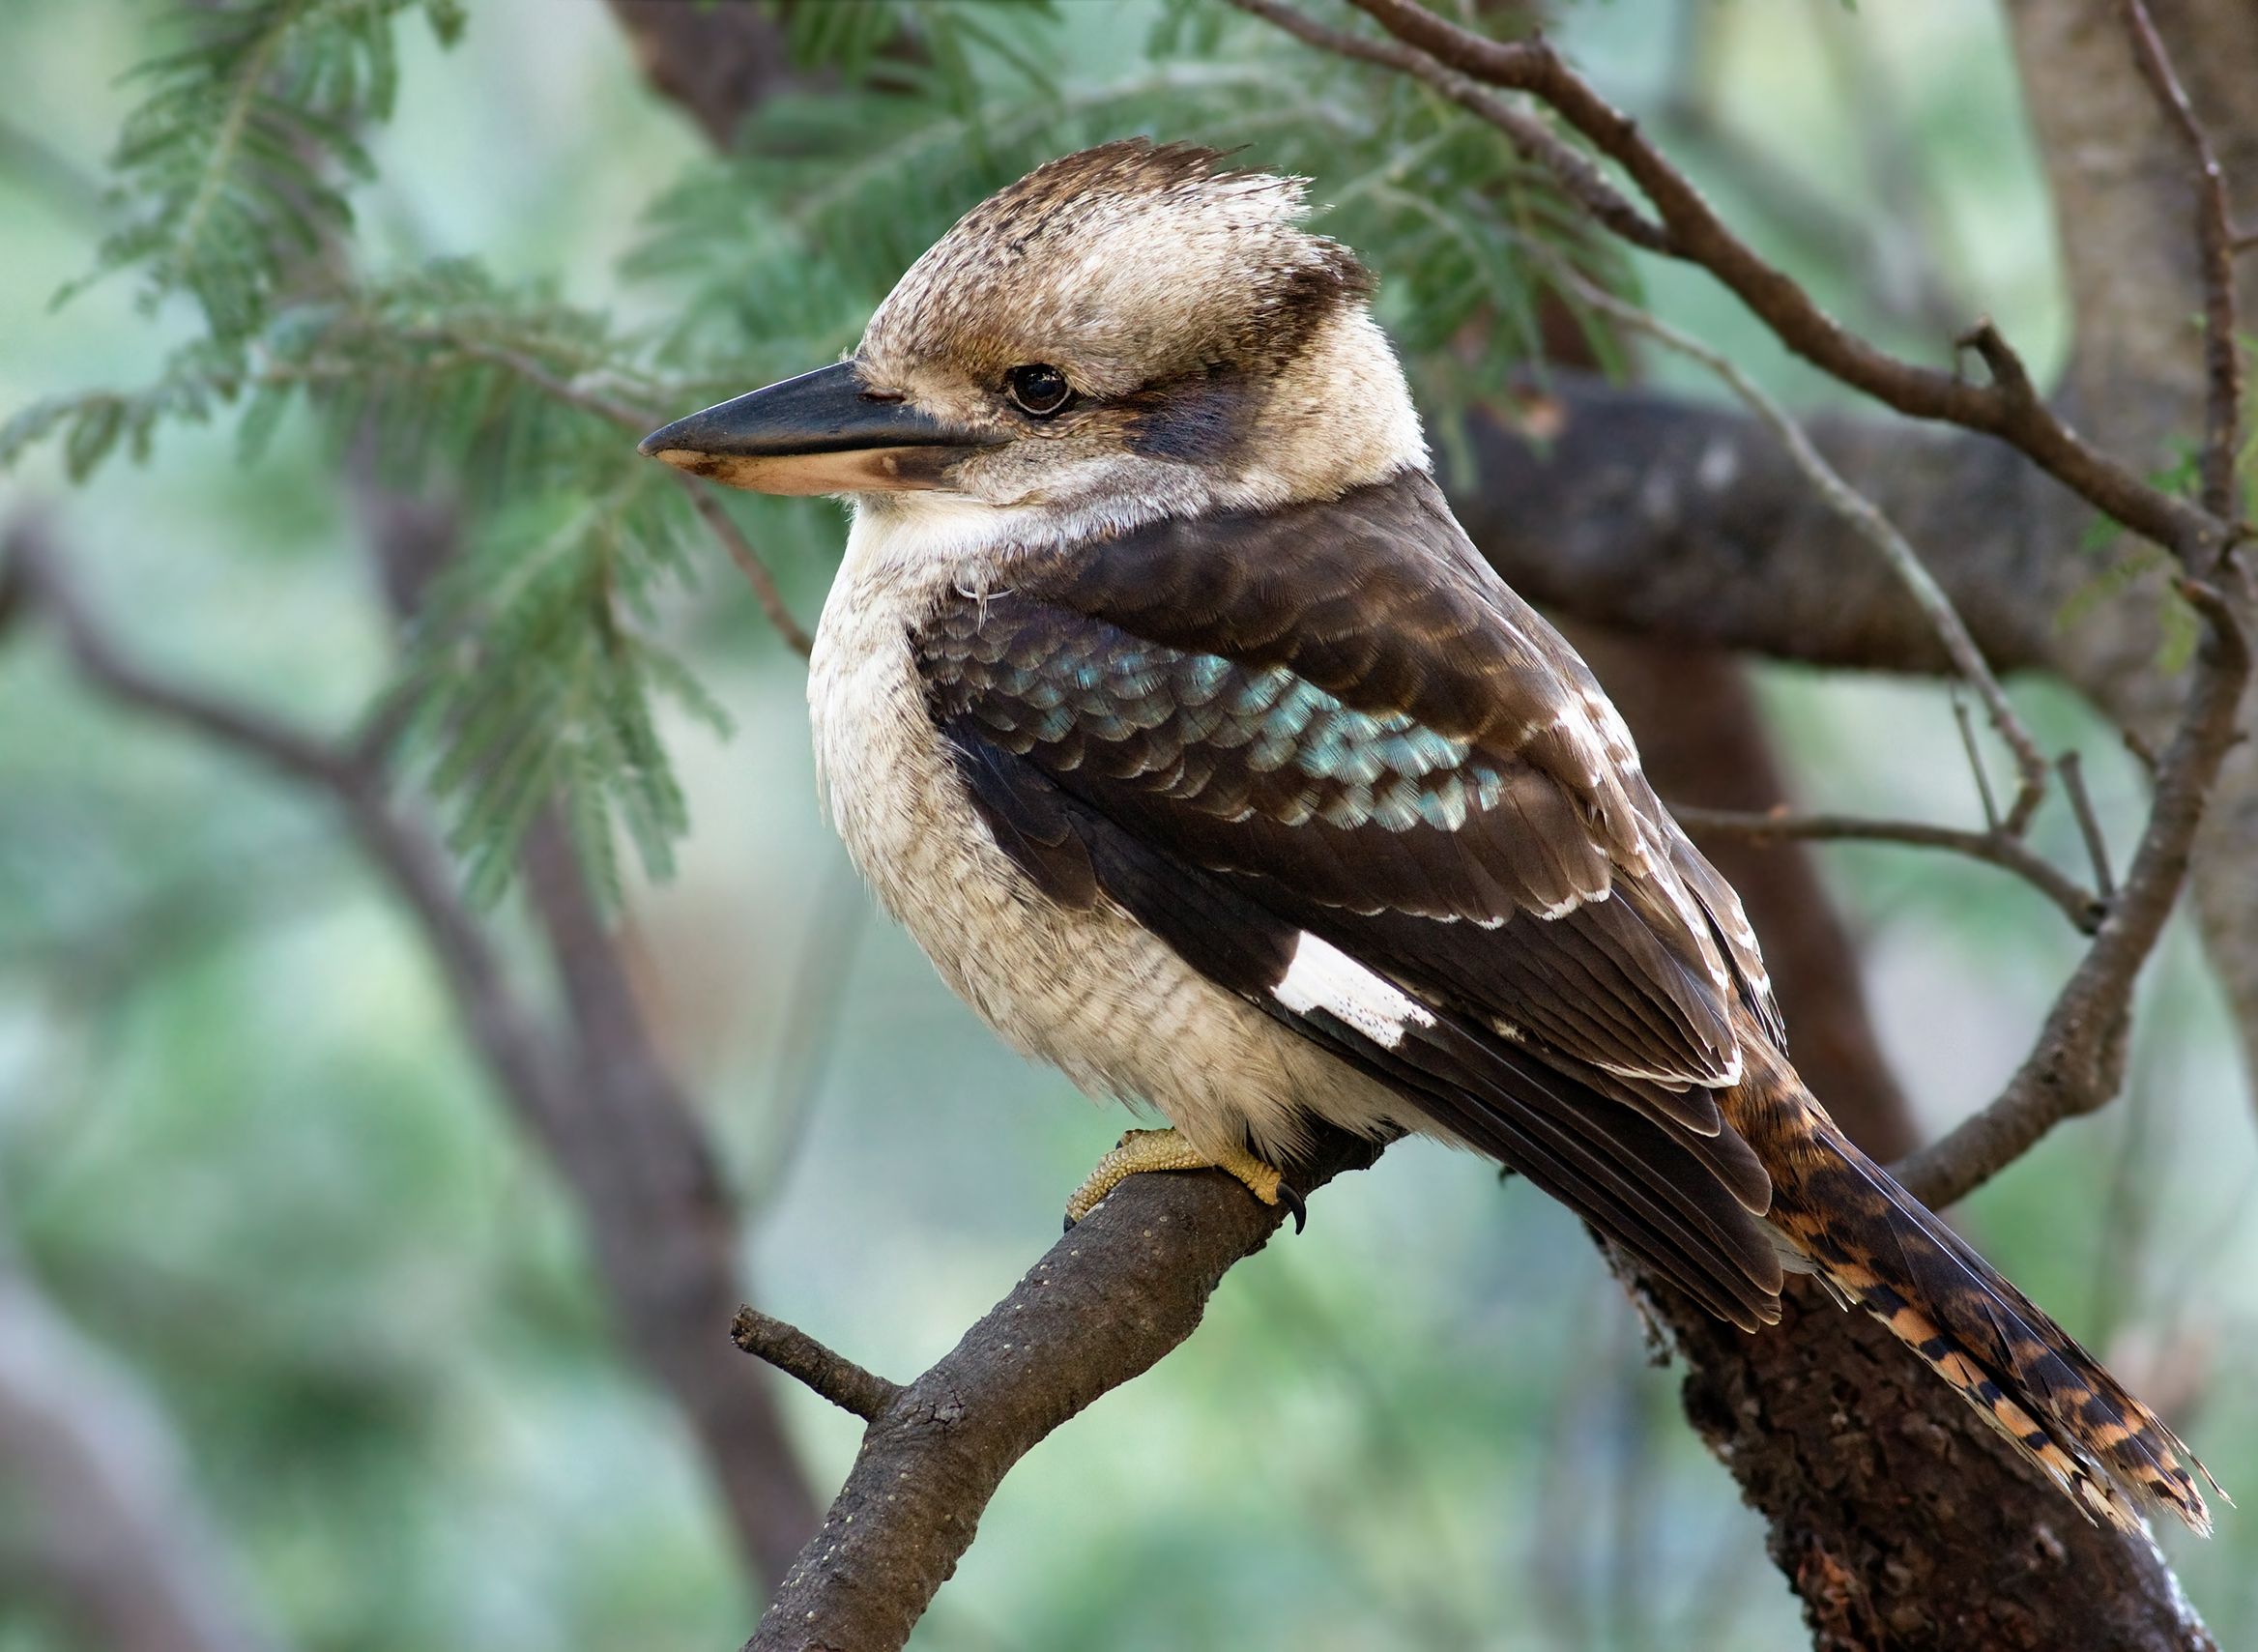 Kookaburra - Wikipedia